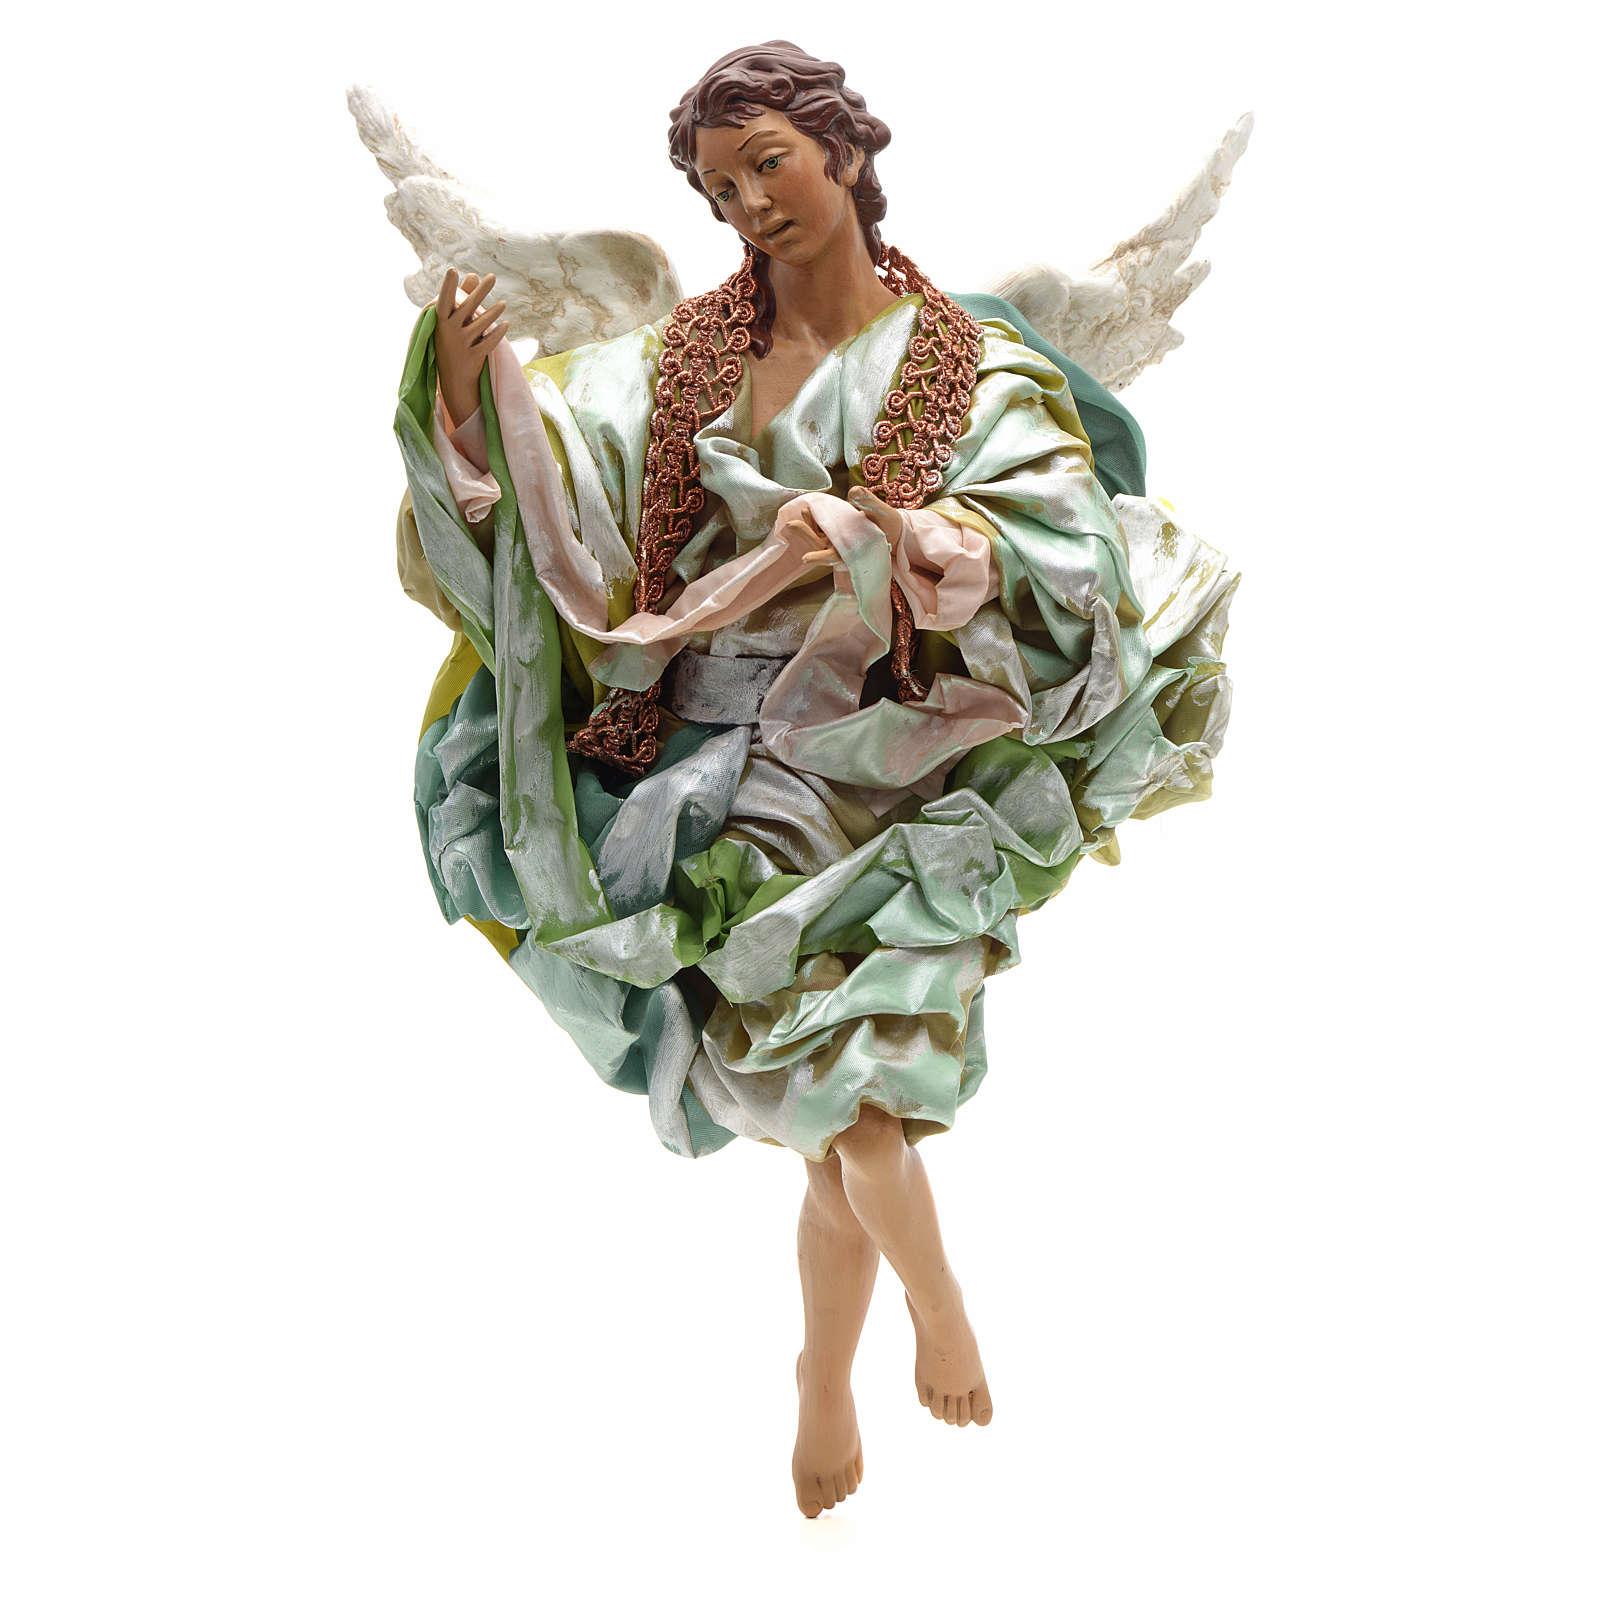 Ángel verde terracota pesebre napolitano 45 cm 4